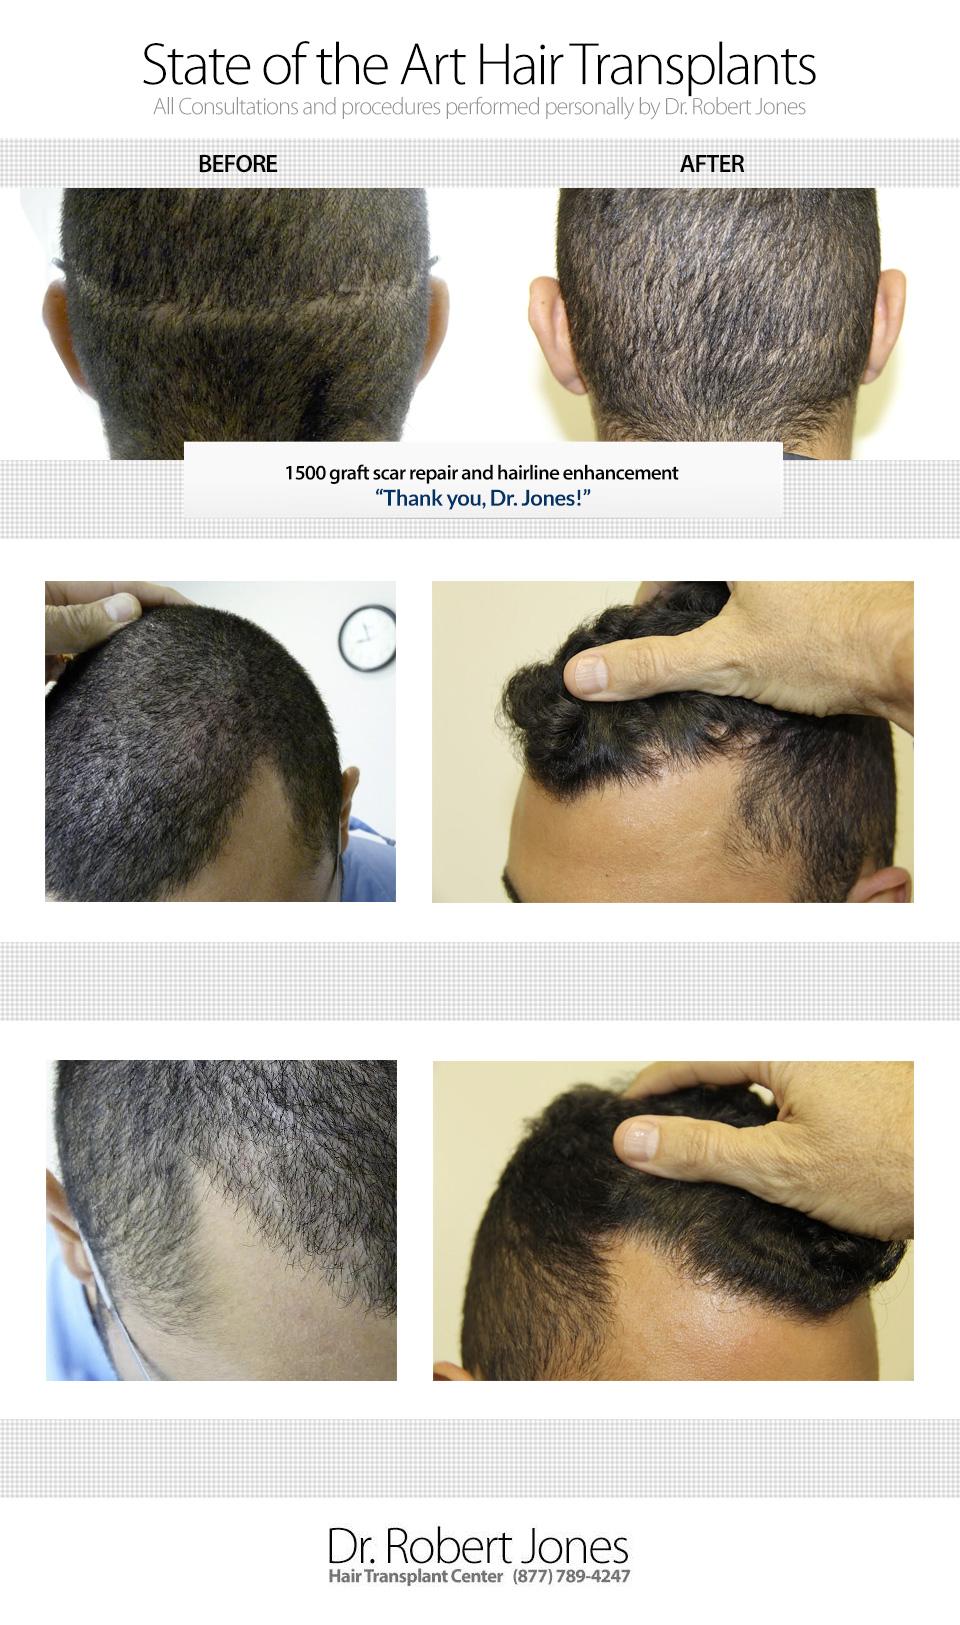 1500-graft-scar-repair-and-hairline-enhancement